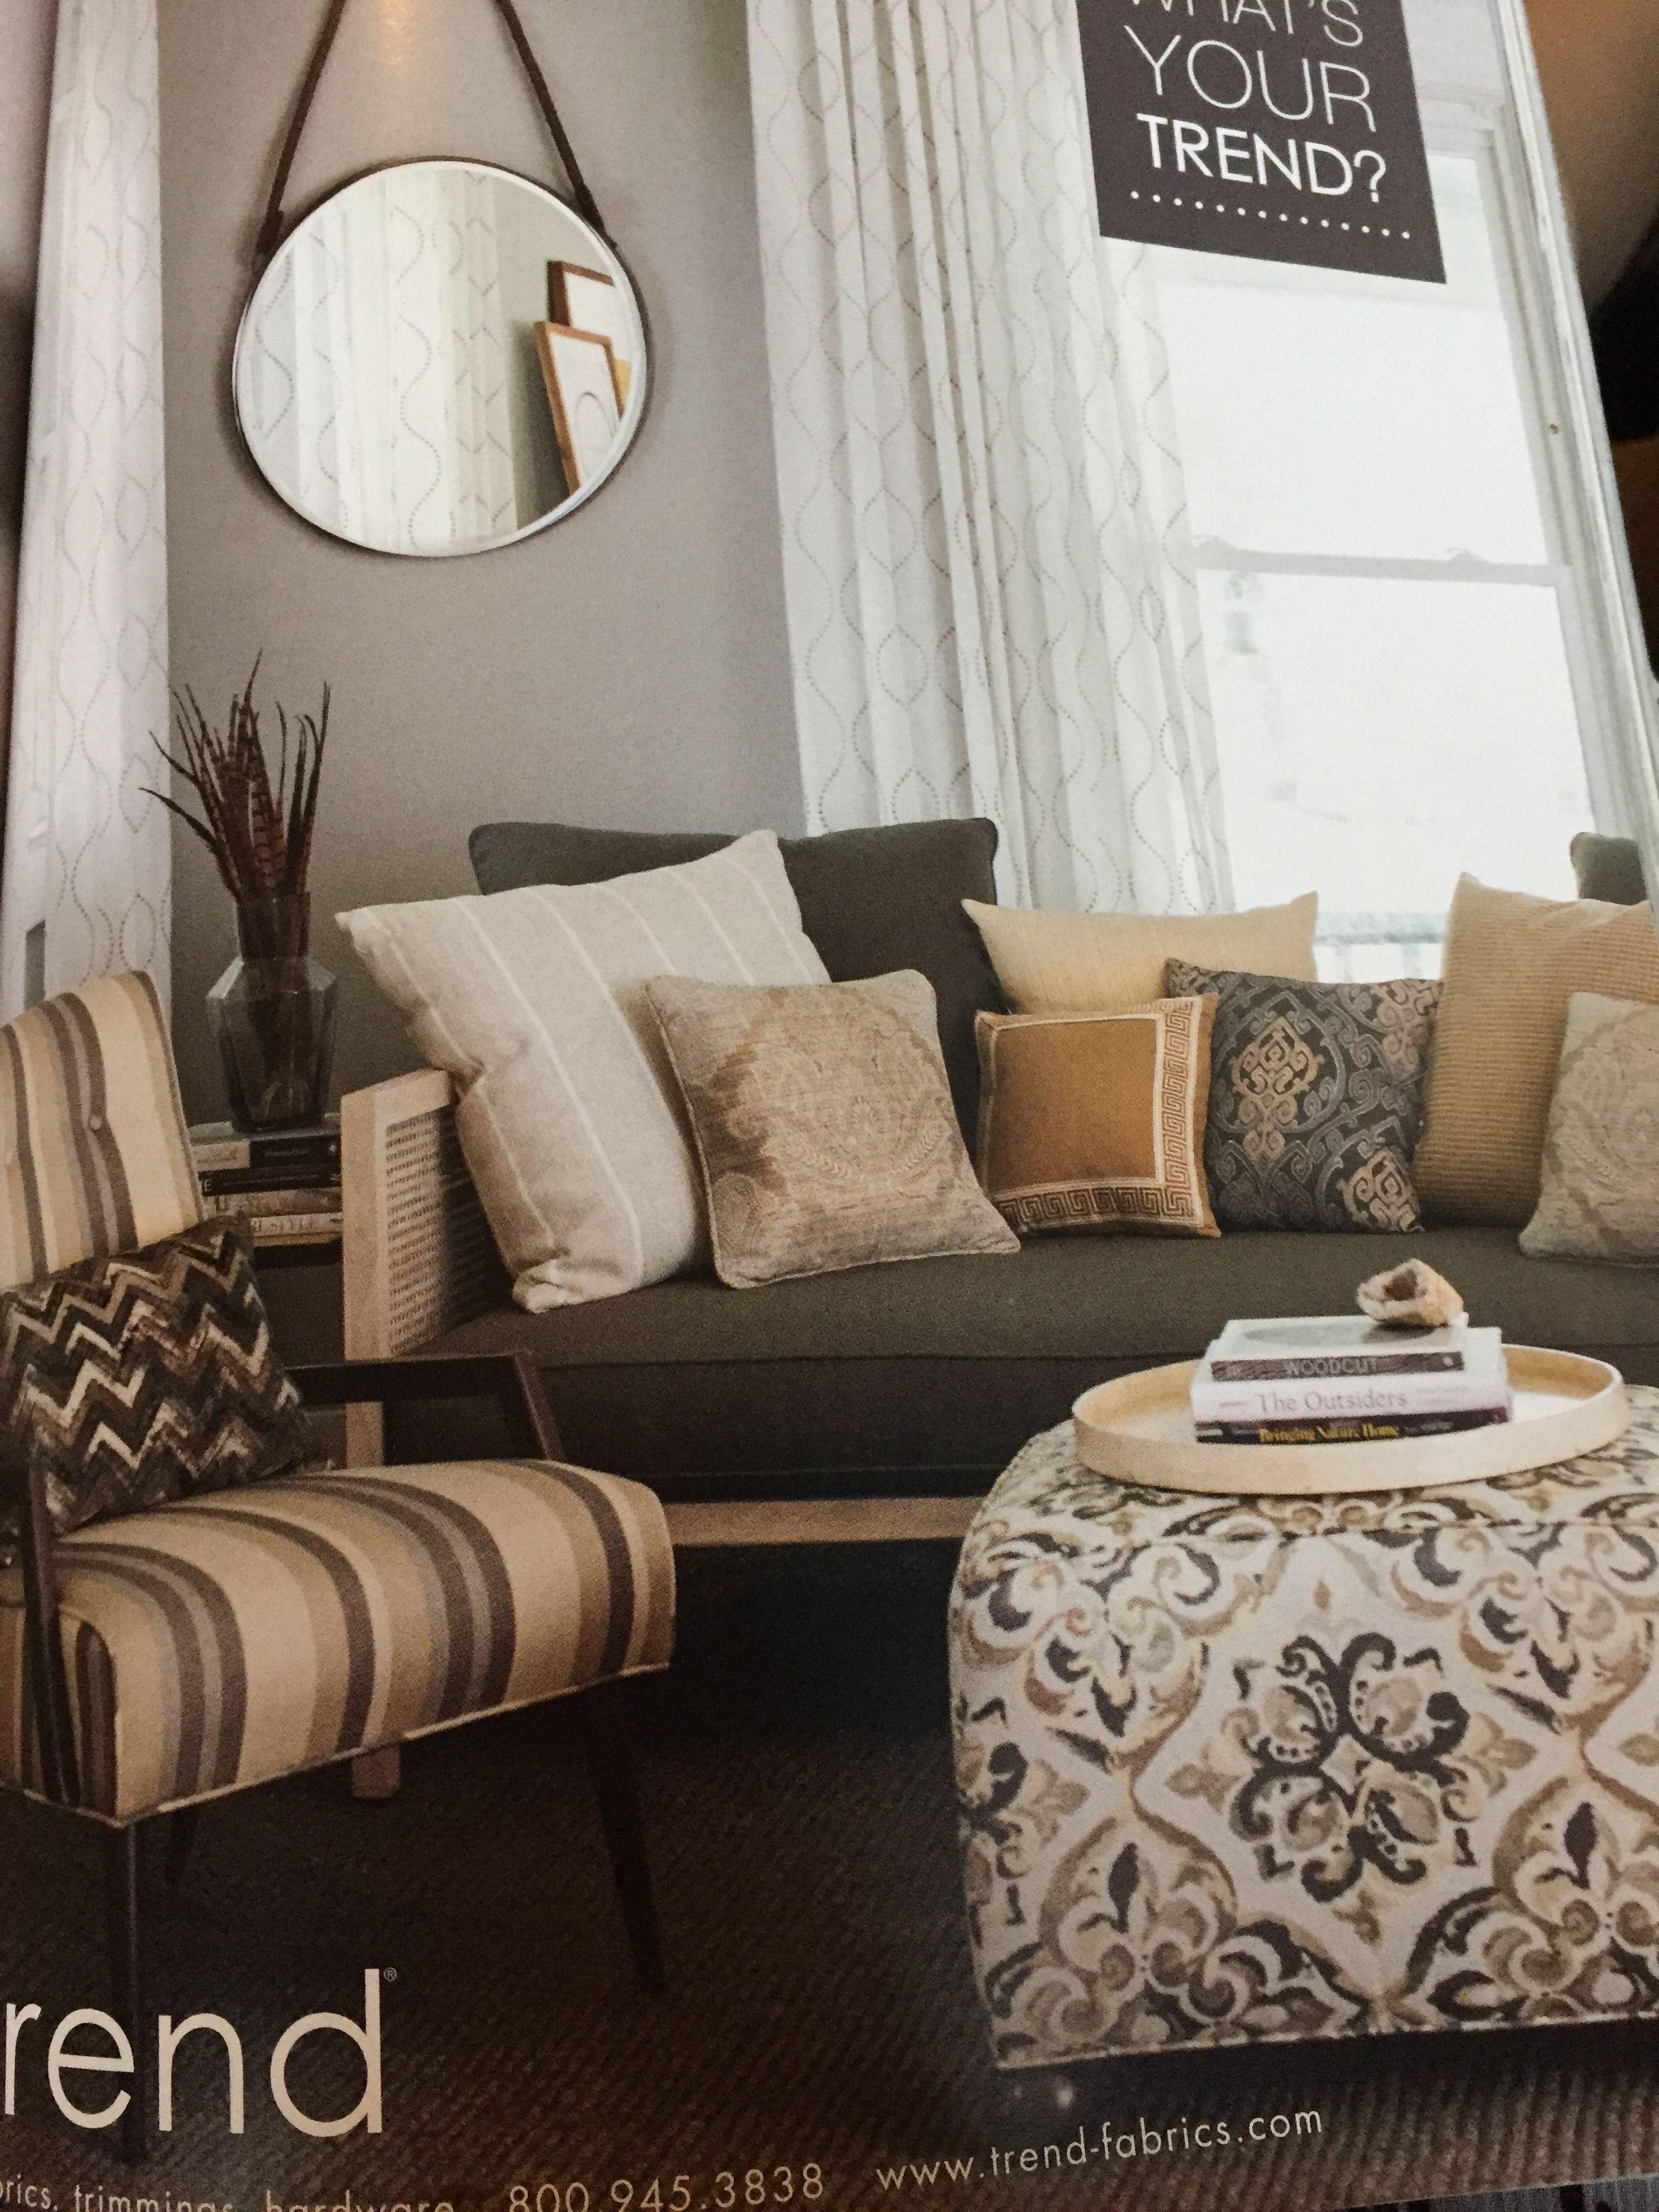 Decorating, Furniture, Decoration, Decor, Dekoration, Home Furnishings, Interiors, Decorations, Dekorasyon